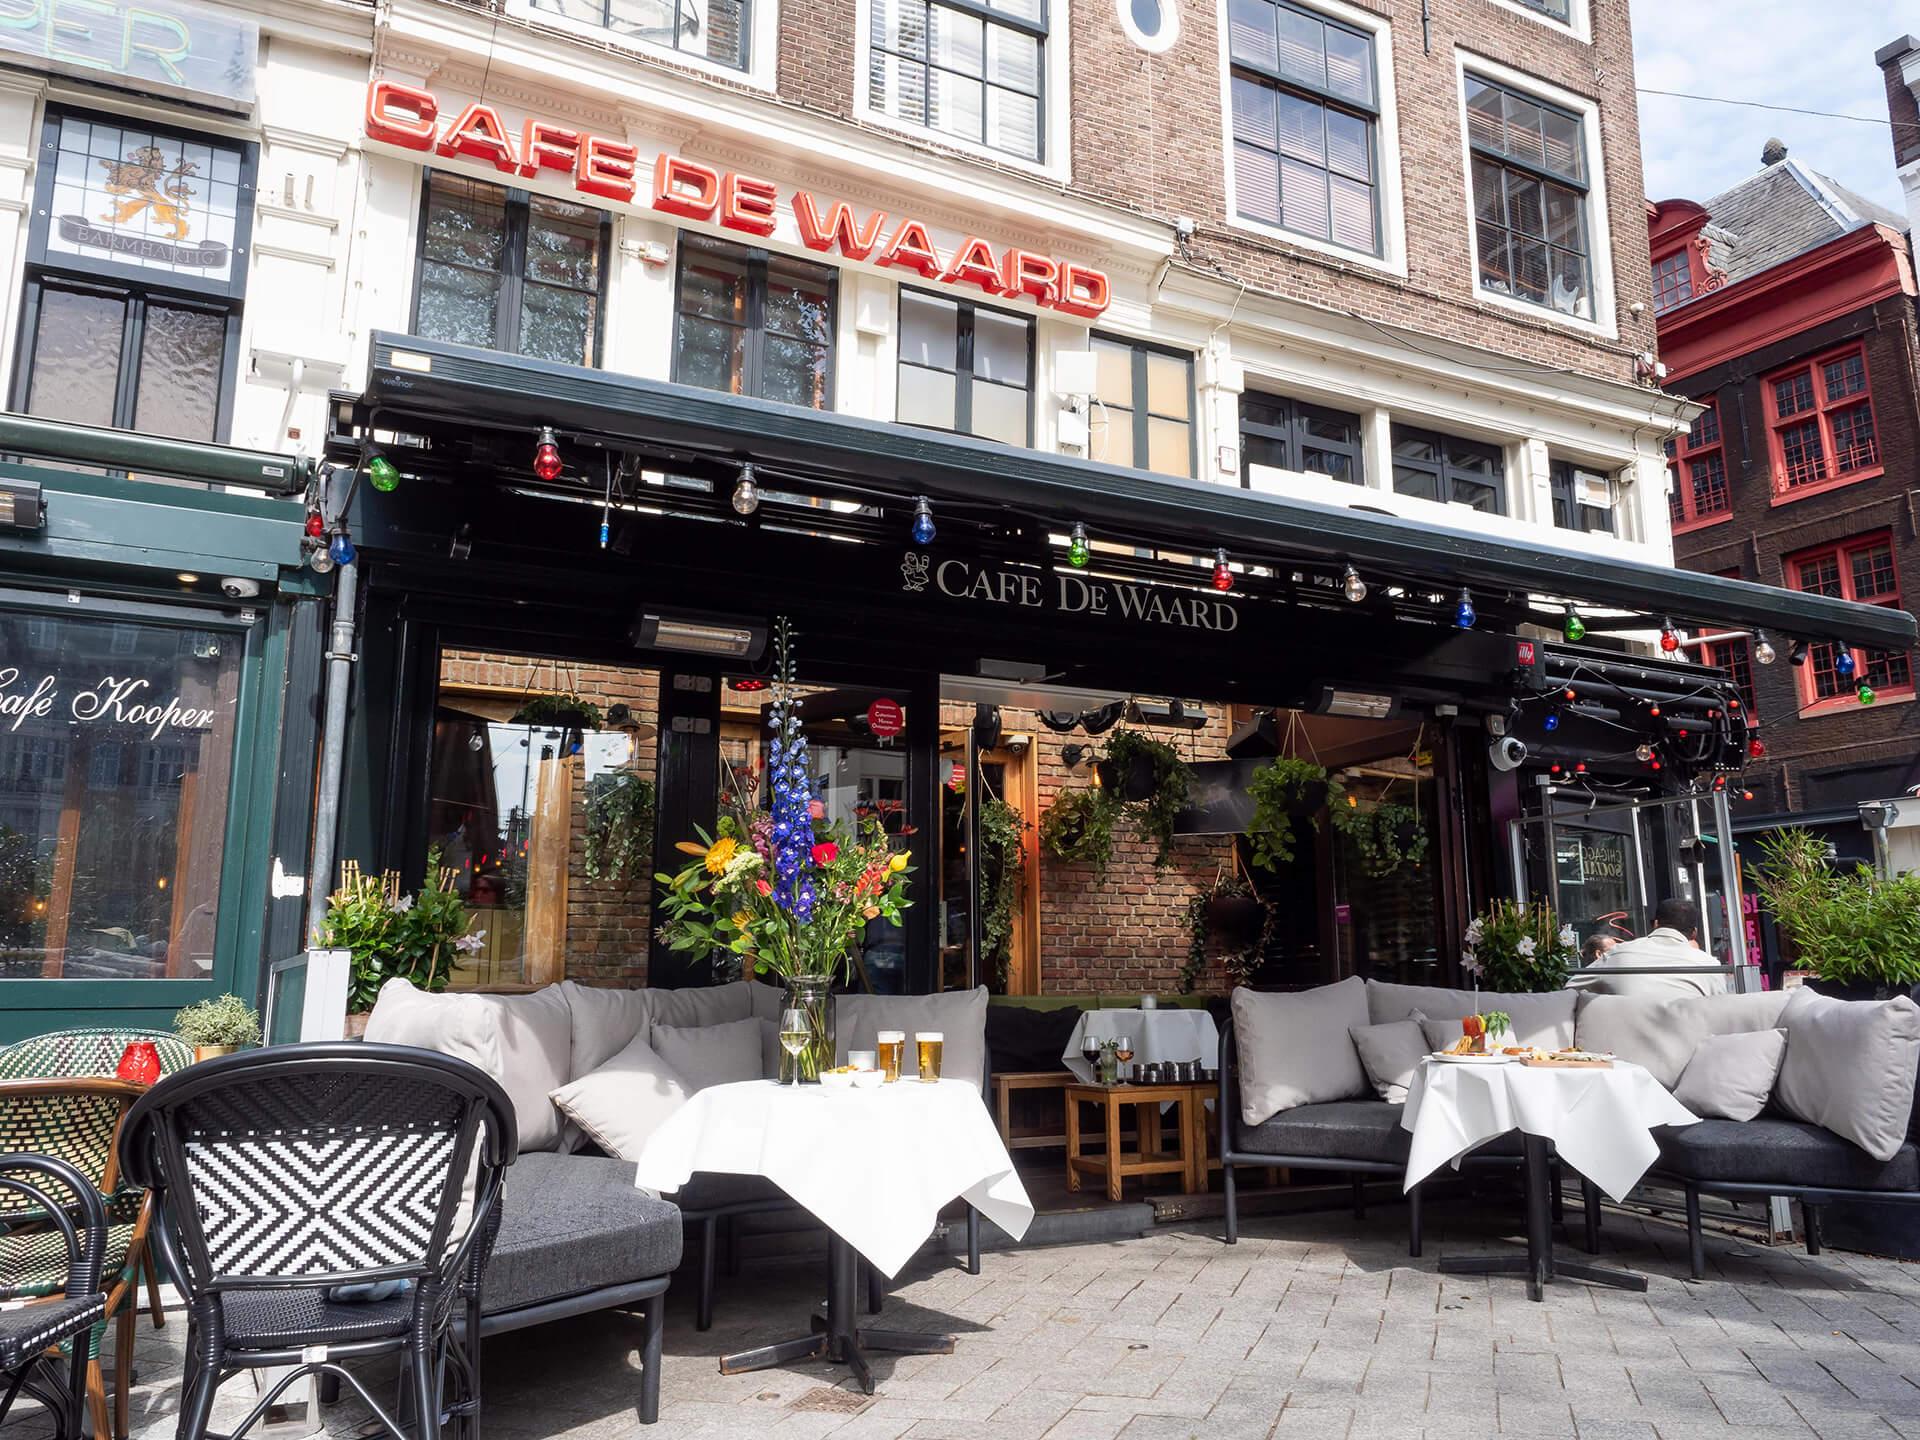 de-Waard-Amsterdam-Leidseplein-Cafe-Terras-by-Marinke-Davelaar-Photography-4288296